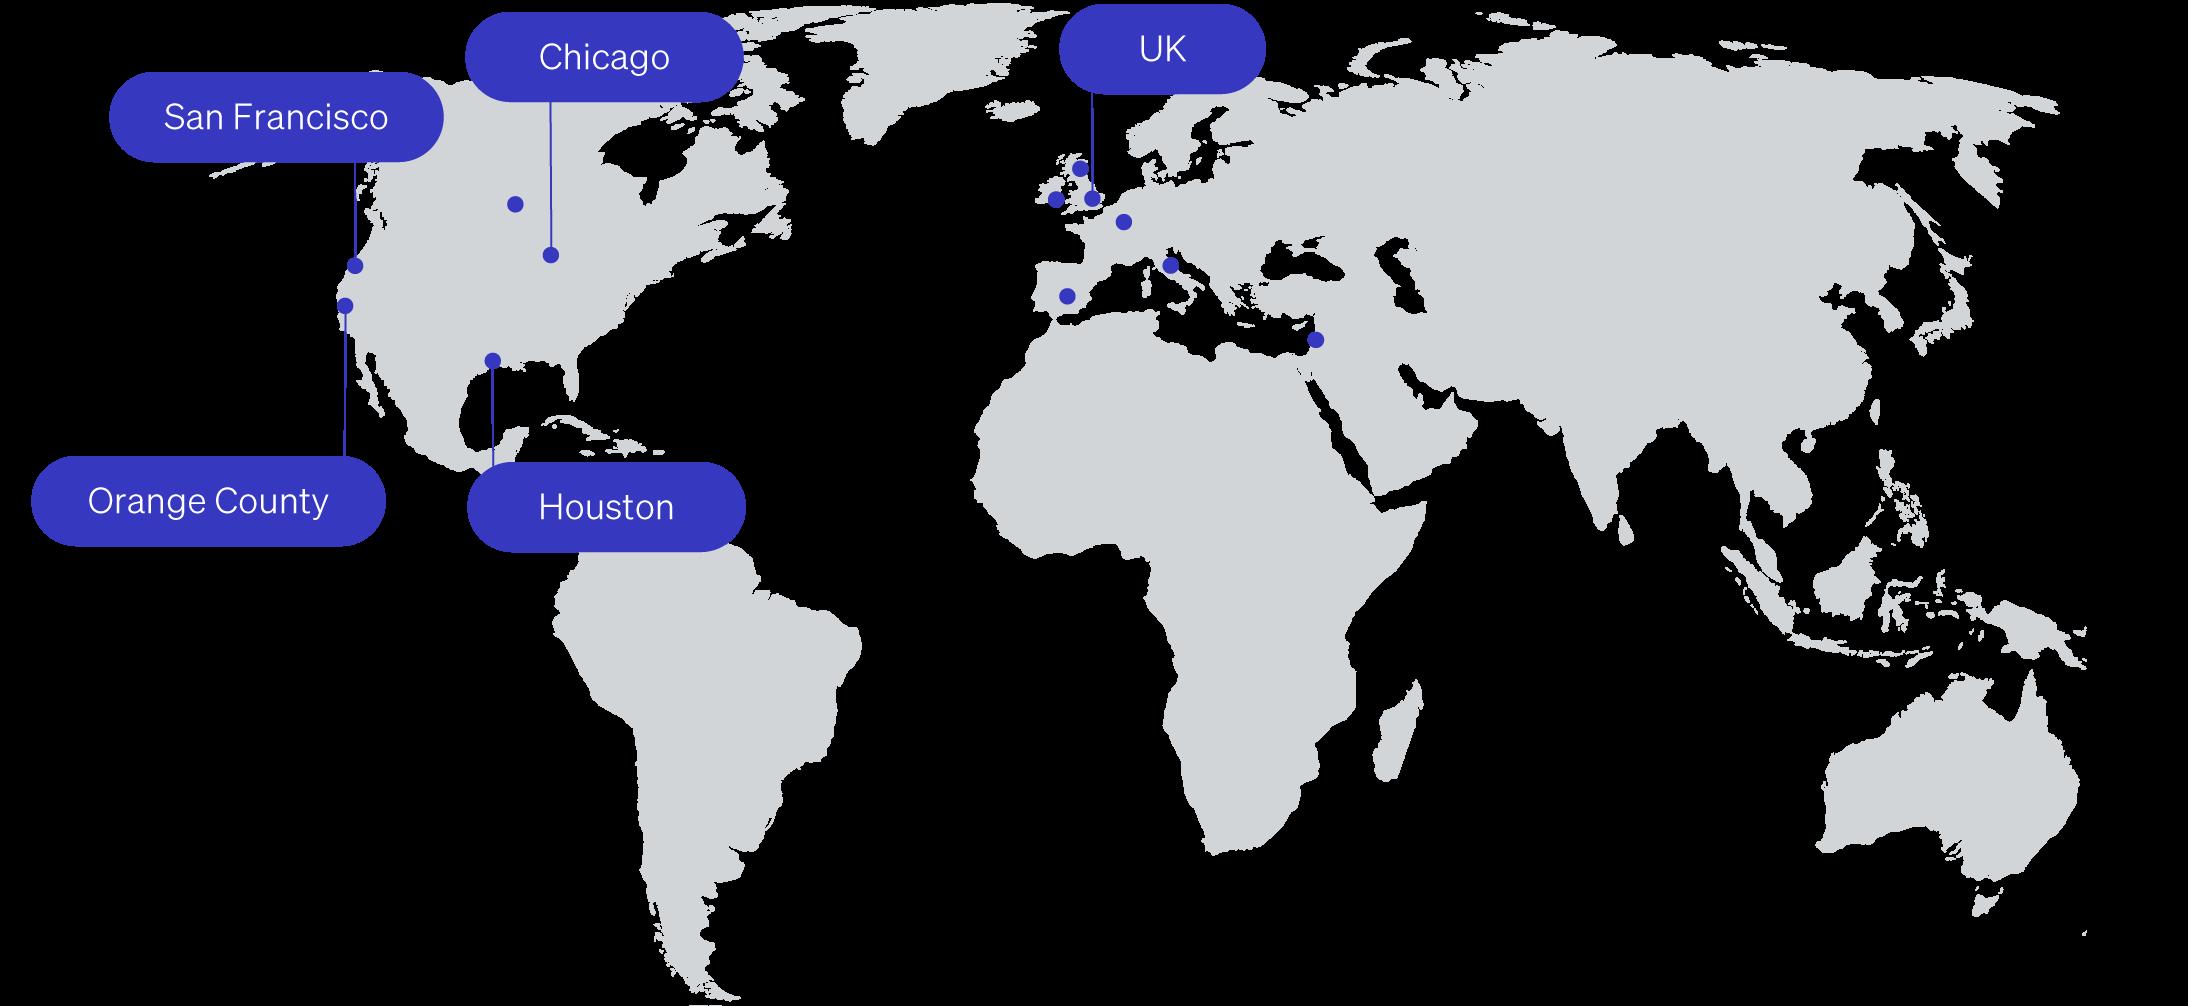 locations-map-desktop